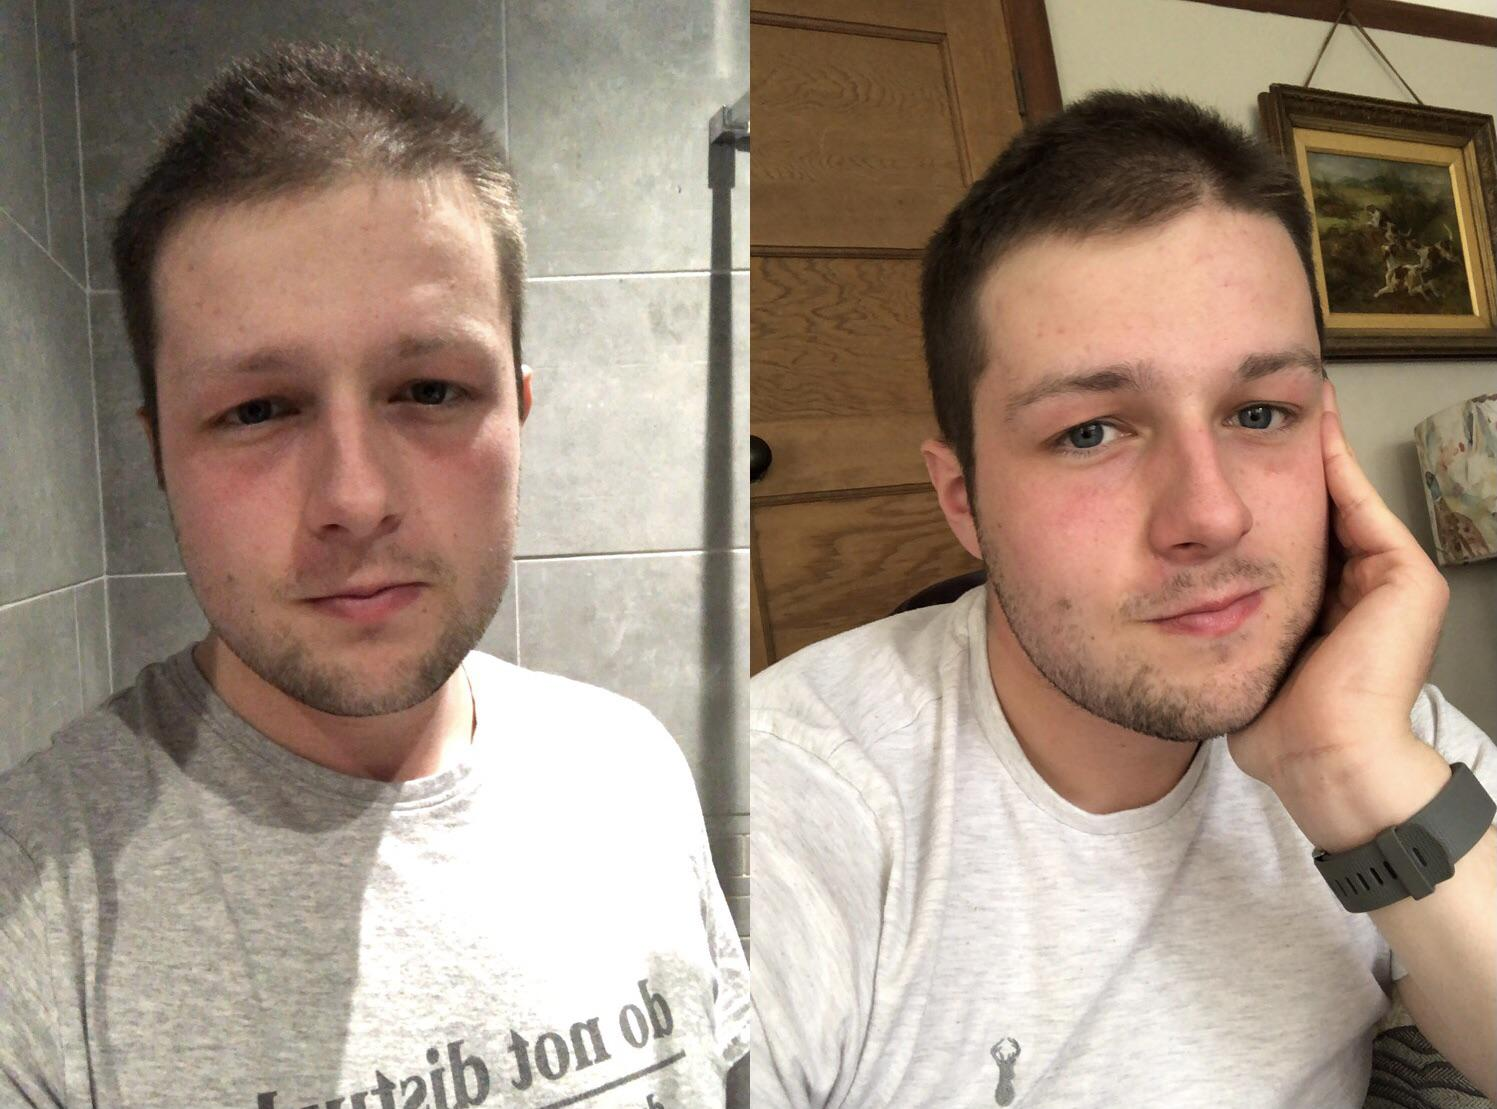 5'10 Male Progress Pics of 11 lbs Weight Loss 216 lbs to 205 lbs